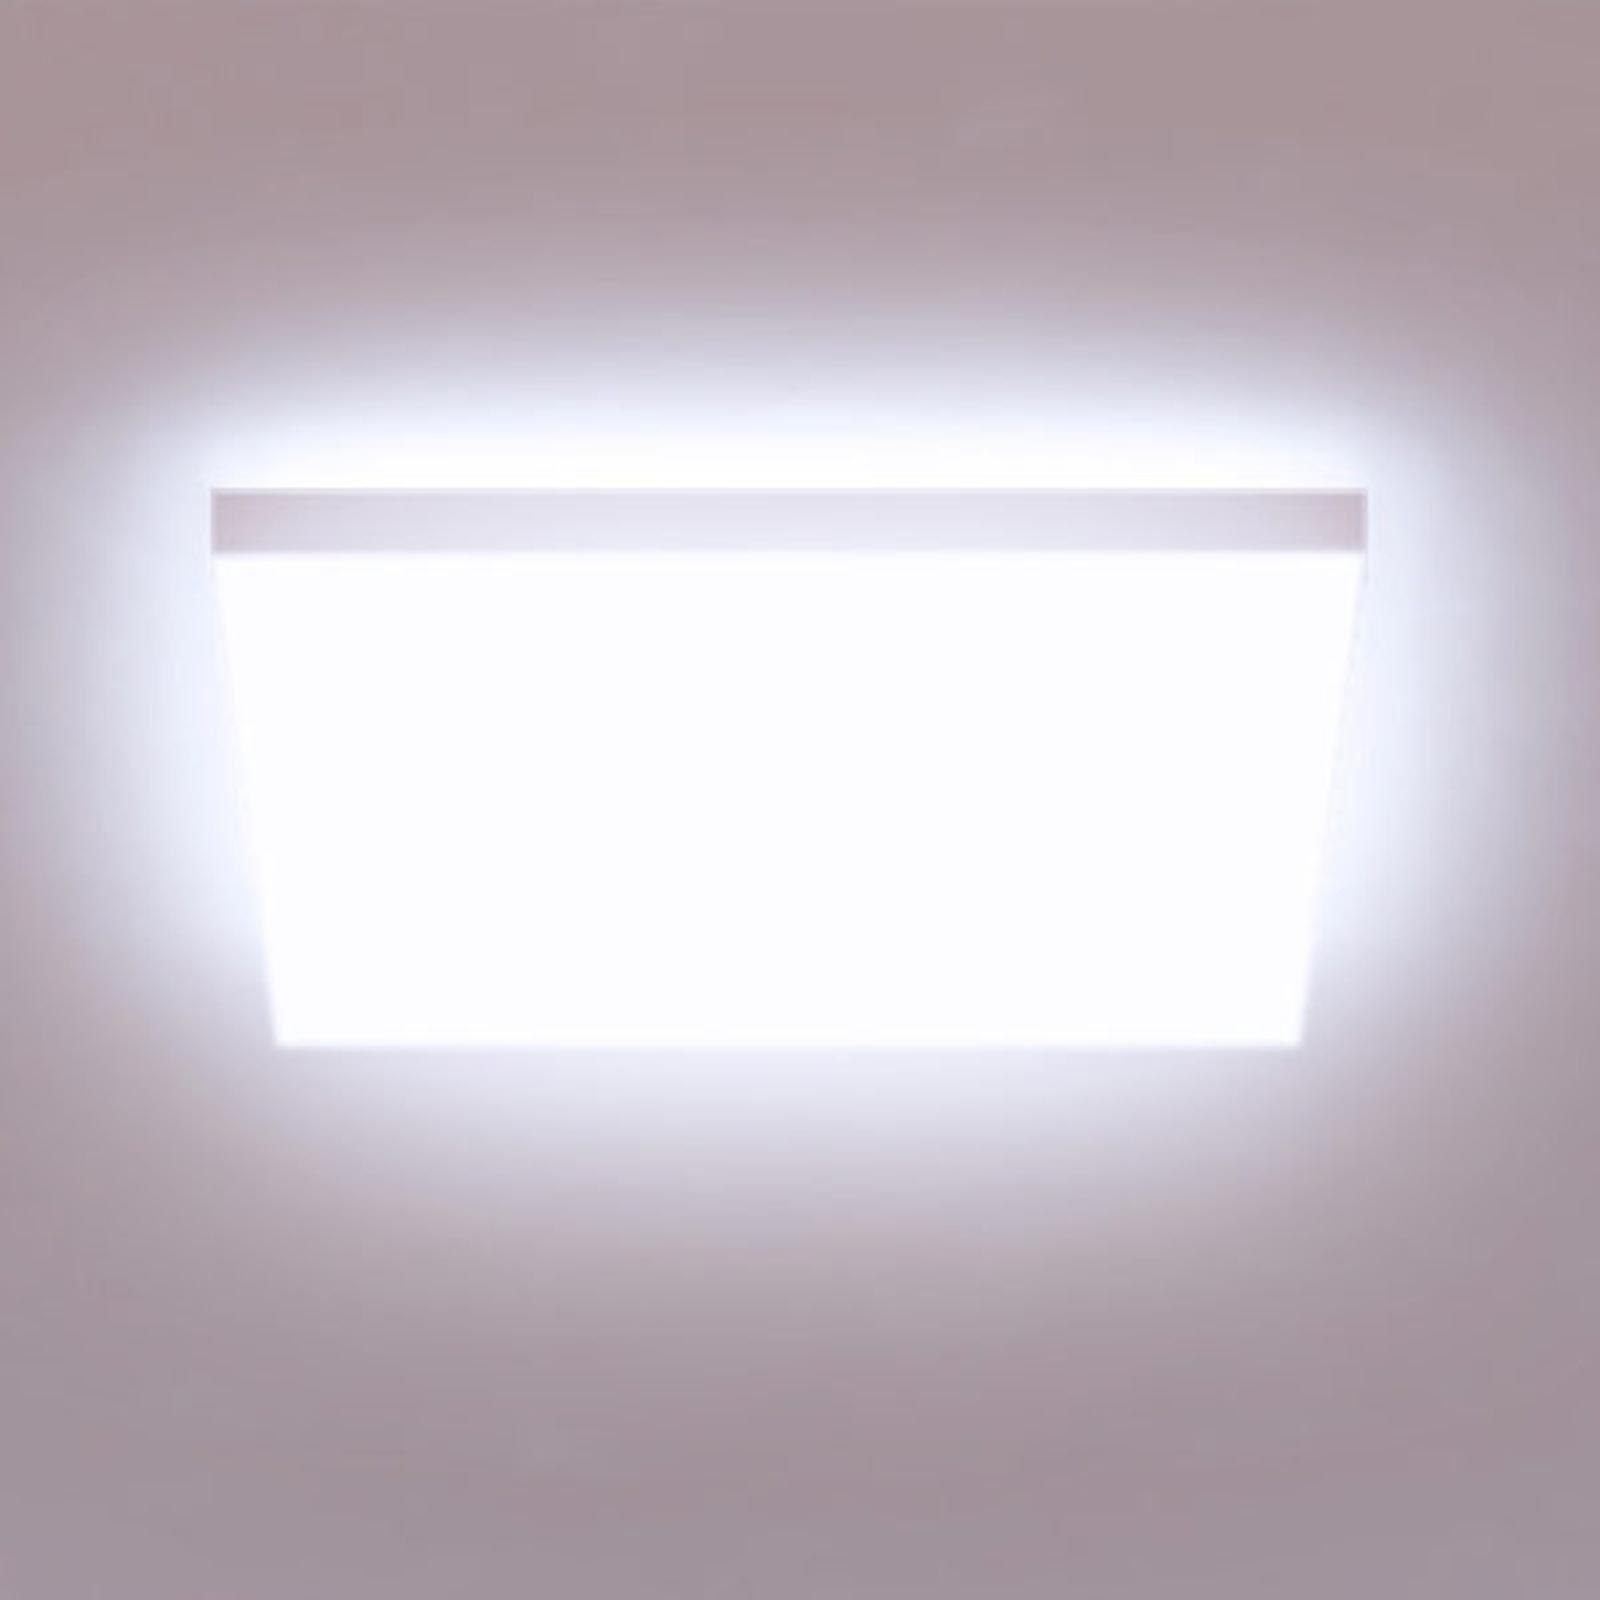 Müller Licht tint Loris LED-panel, 45x45cm